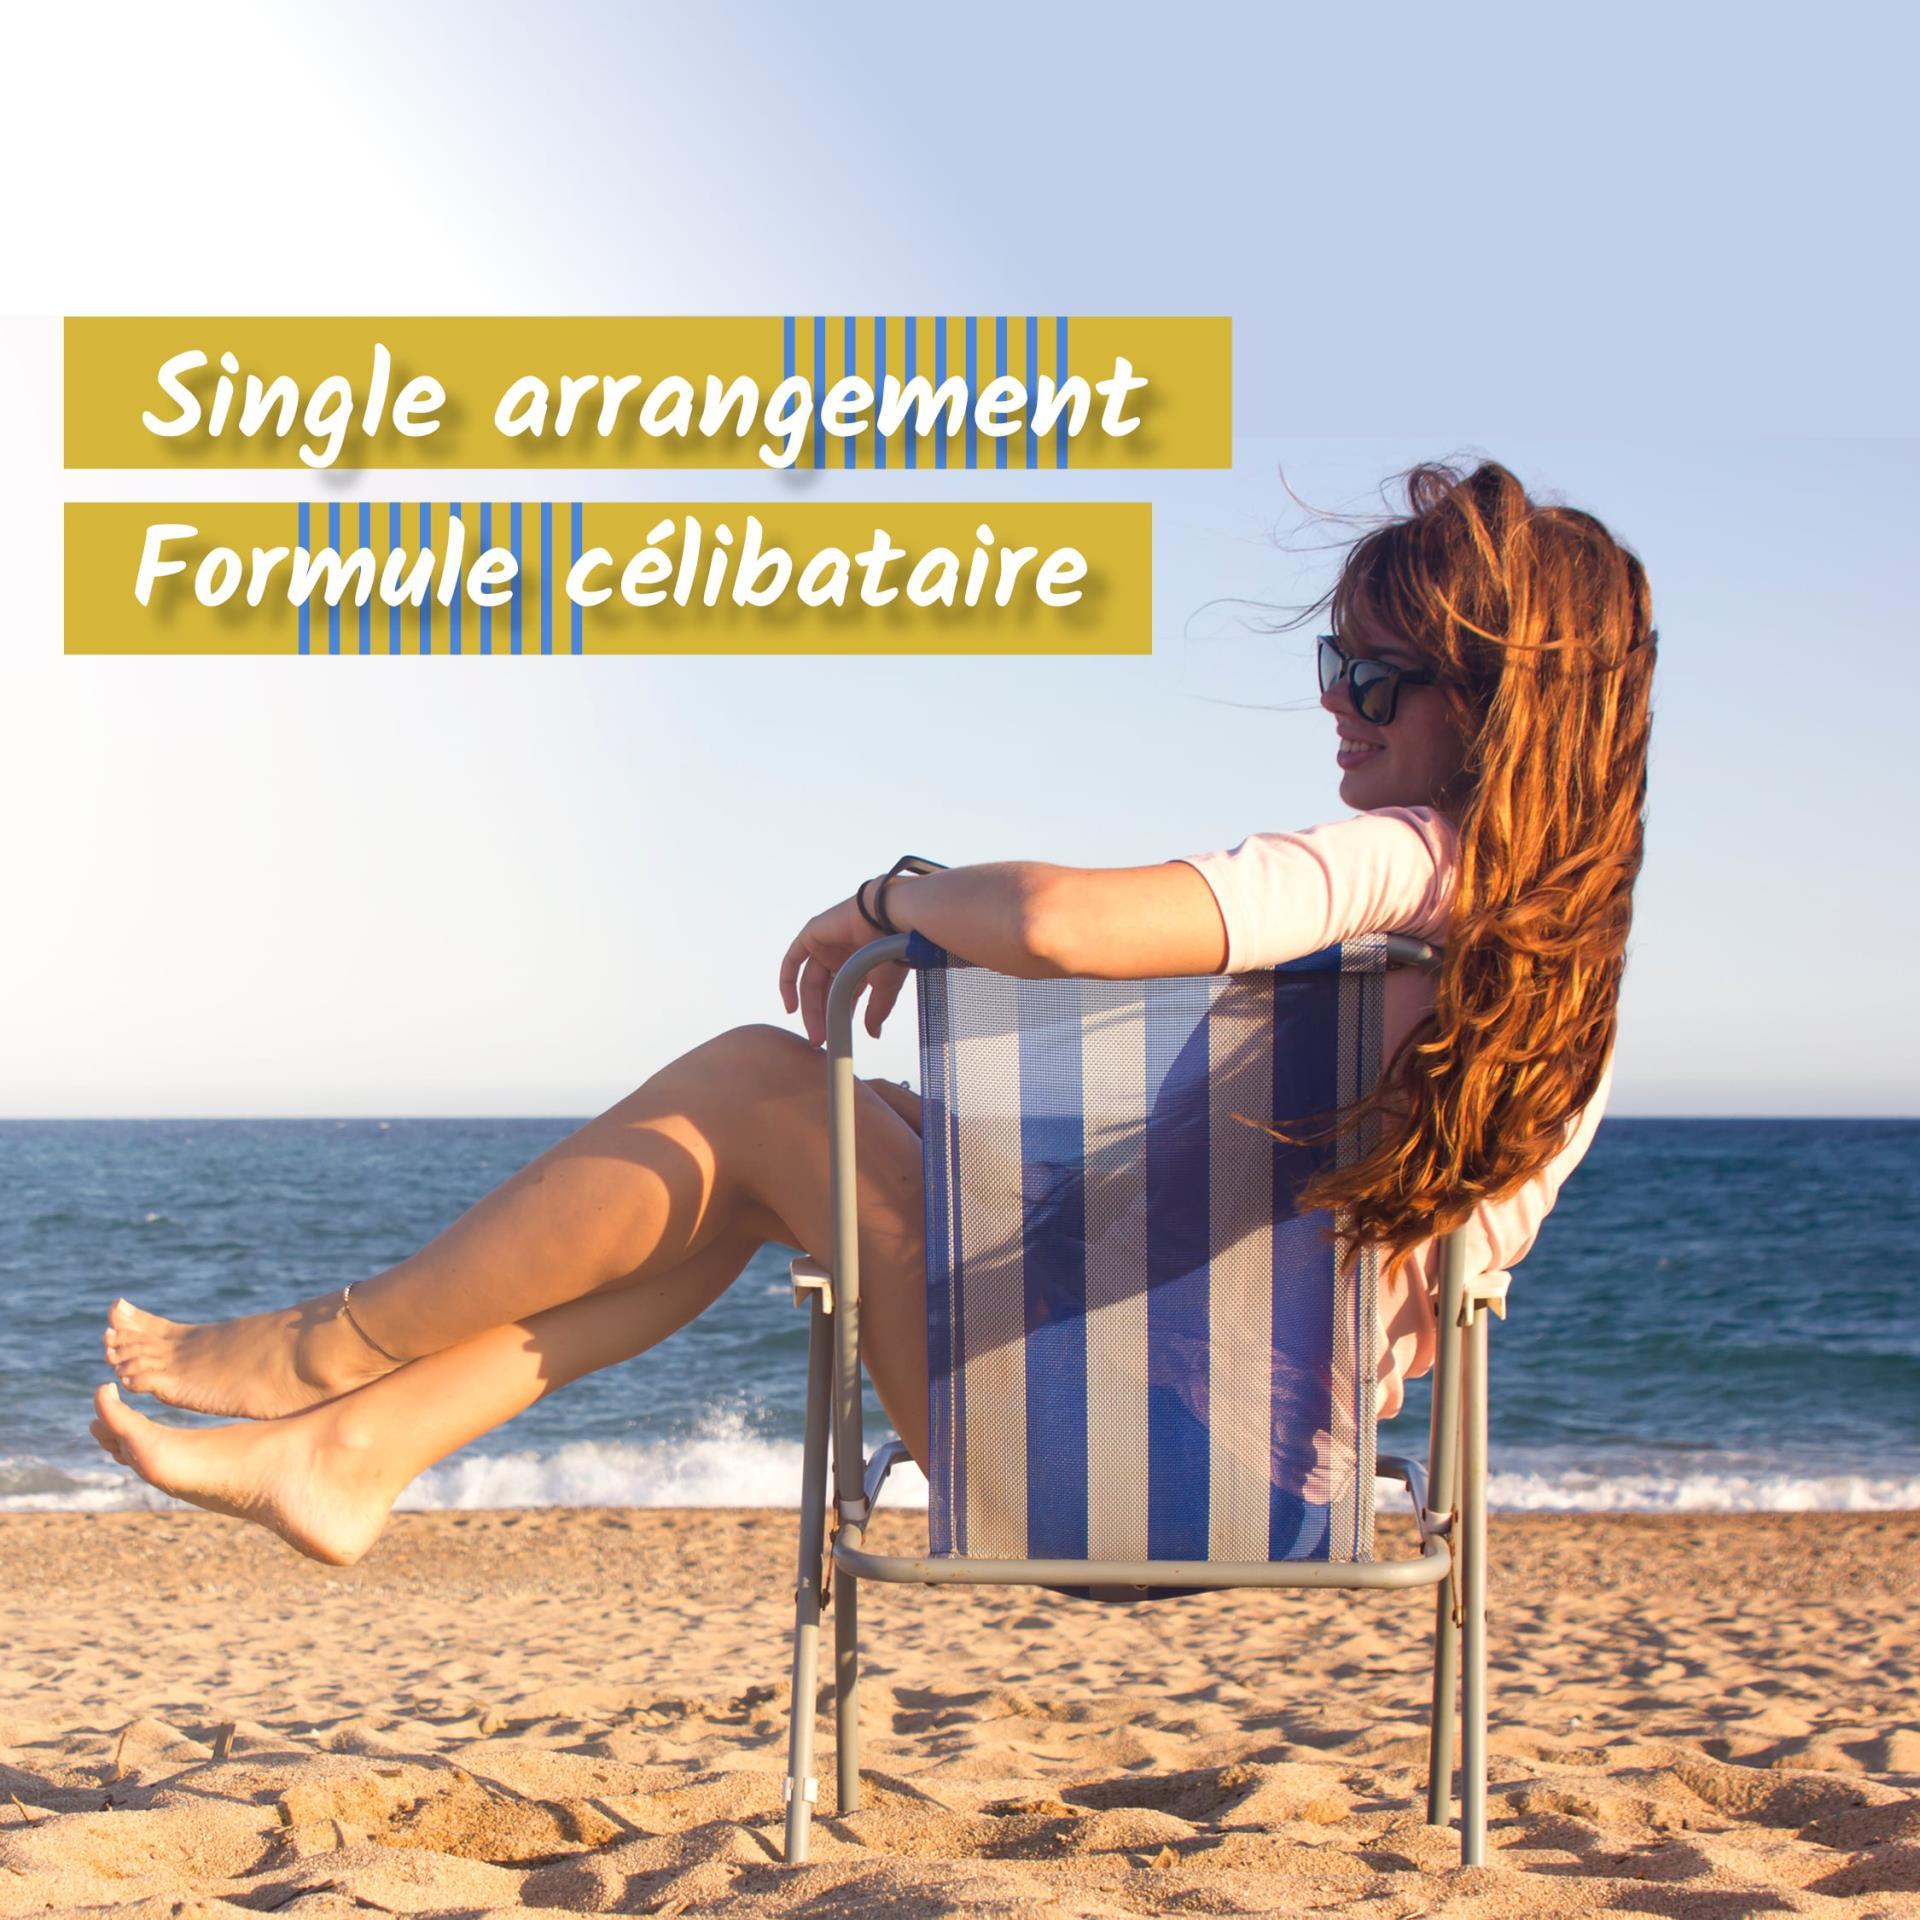 Single arrangement